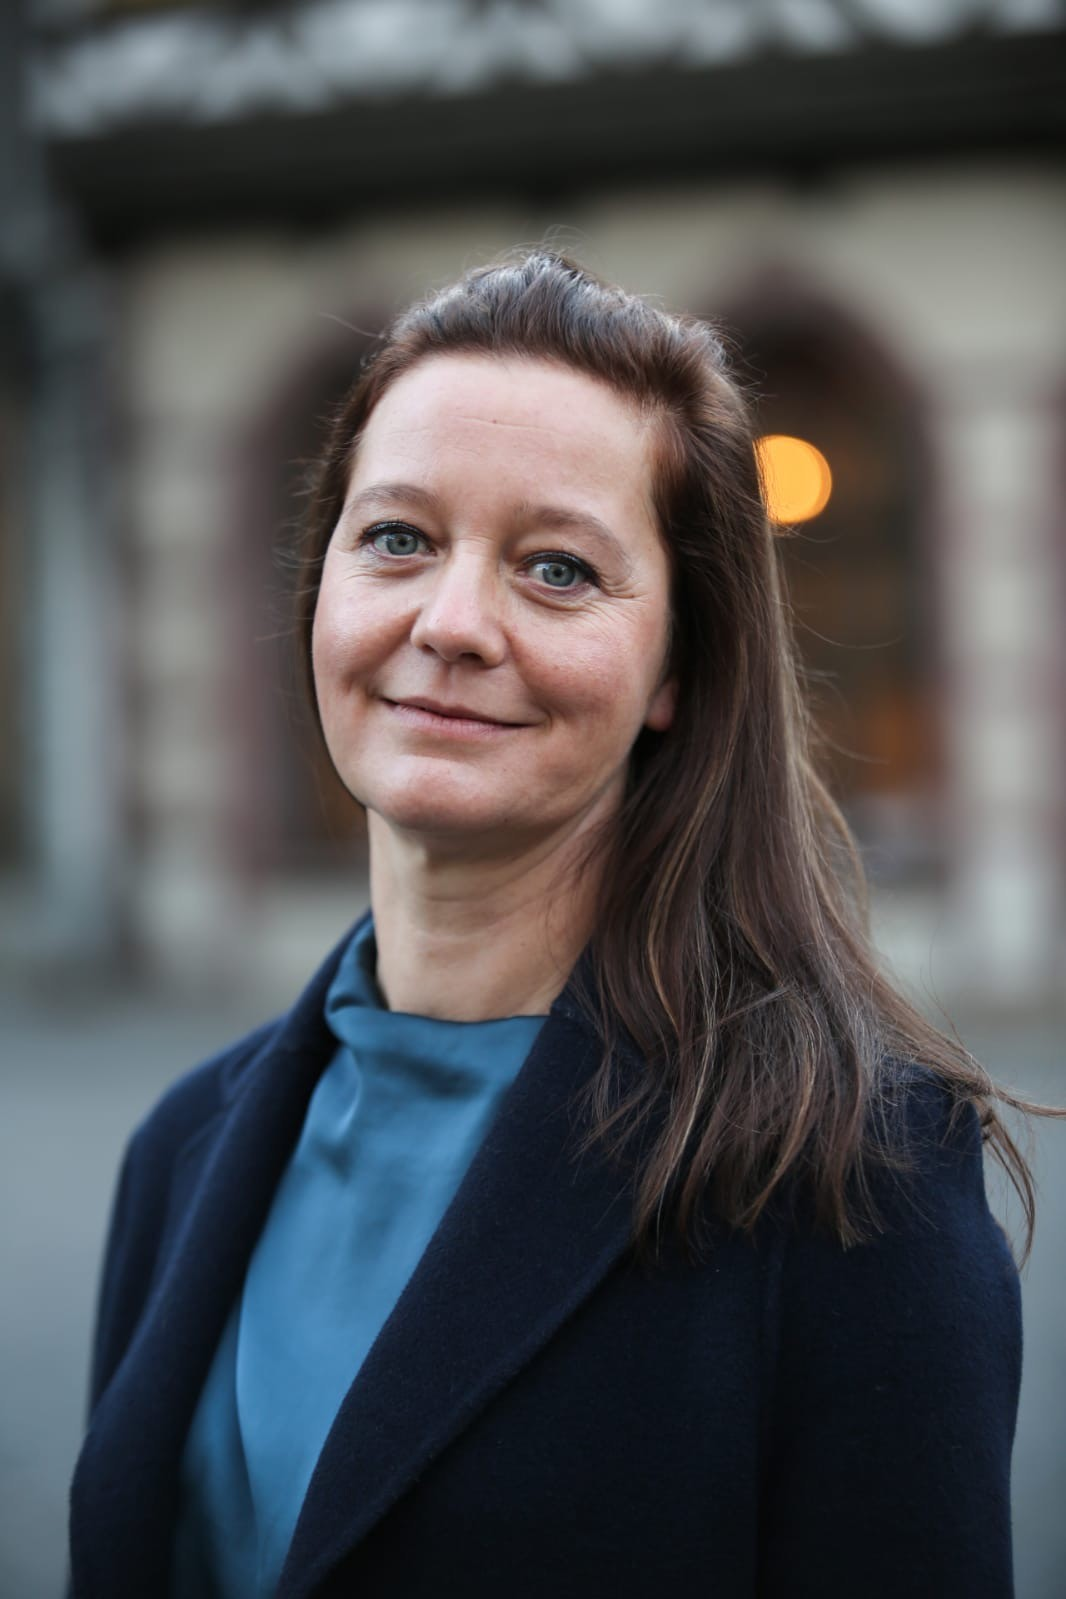 Susann Neuber